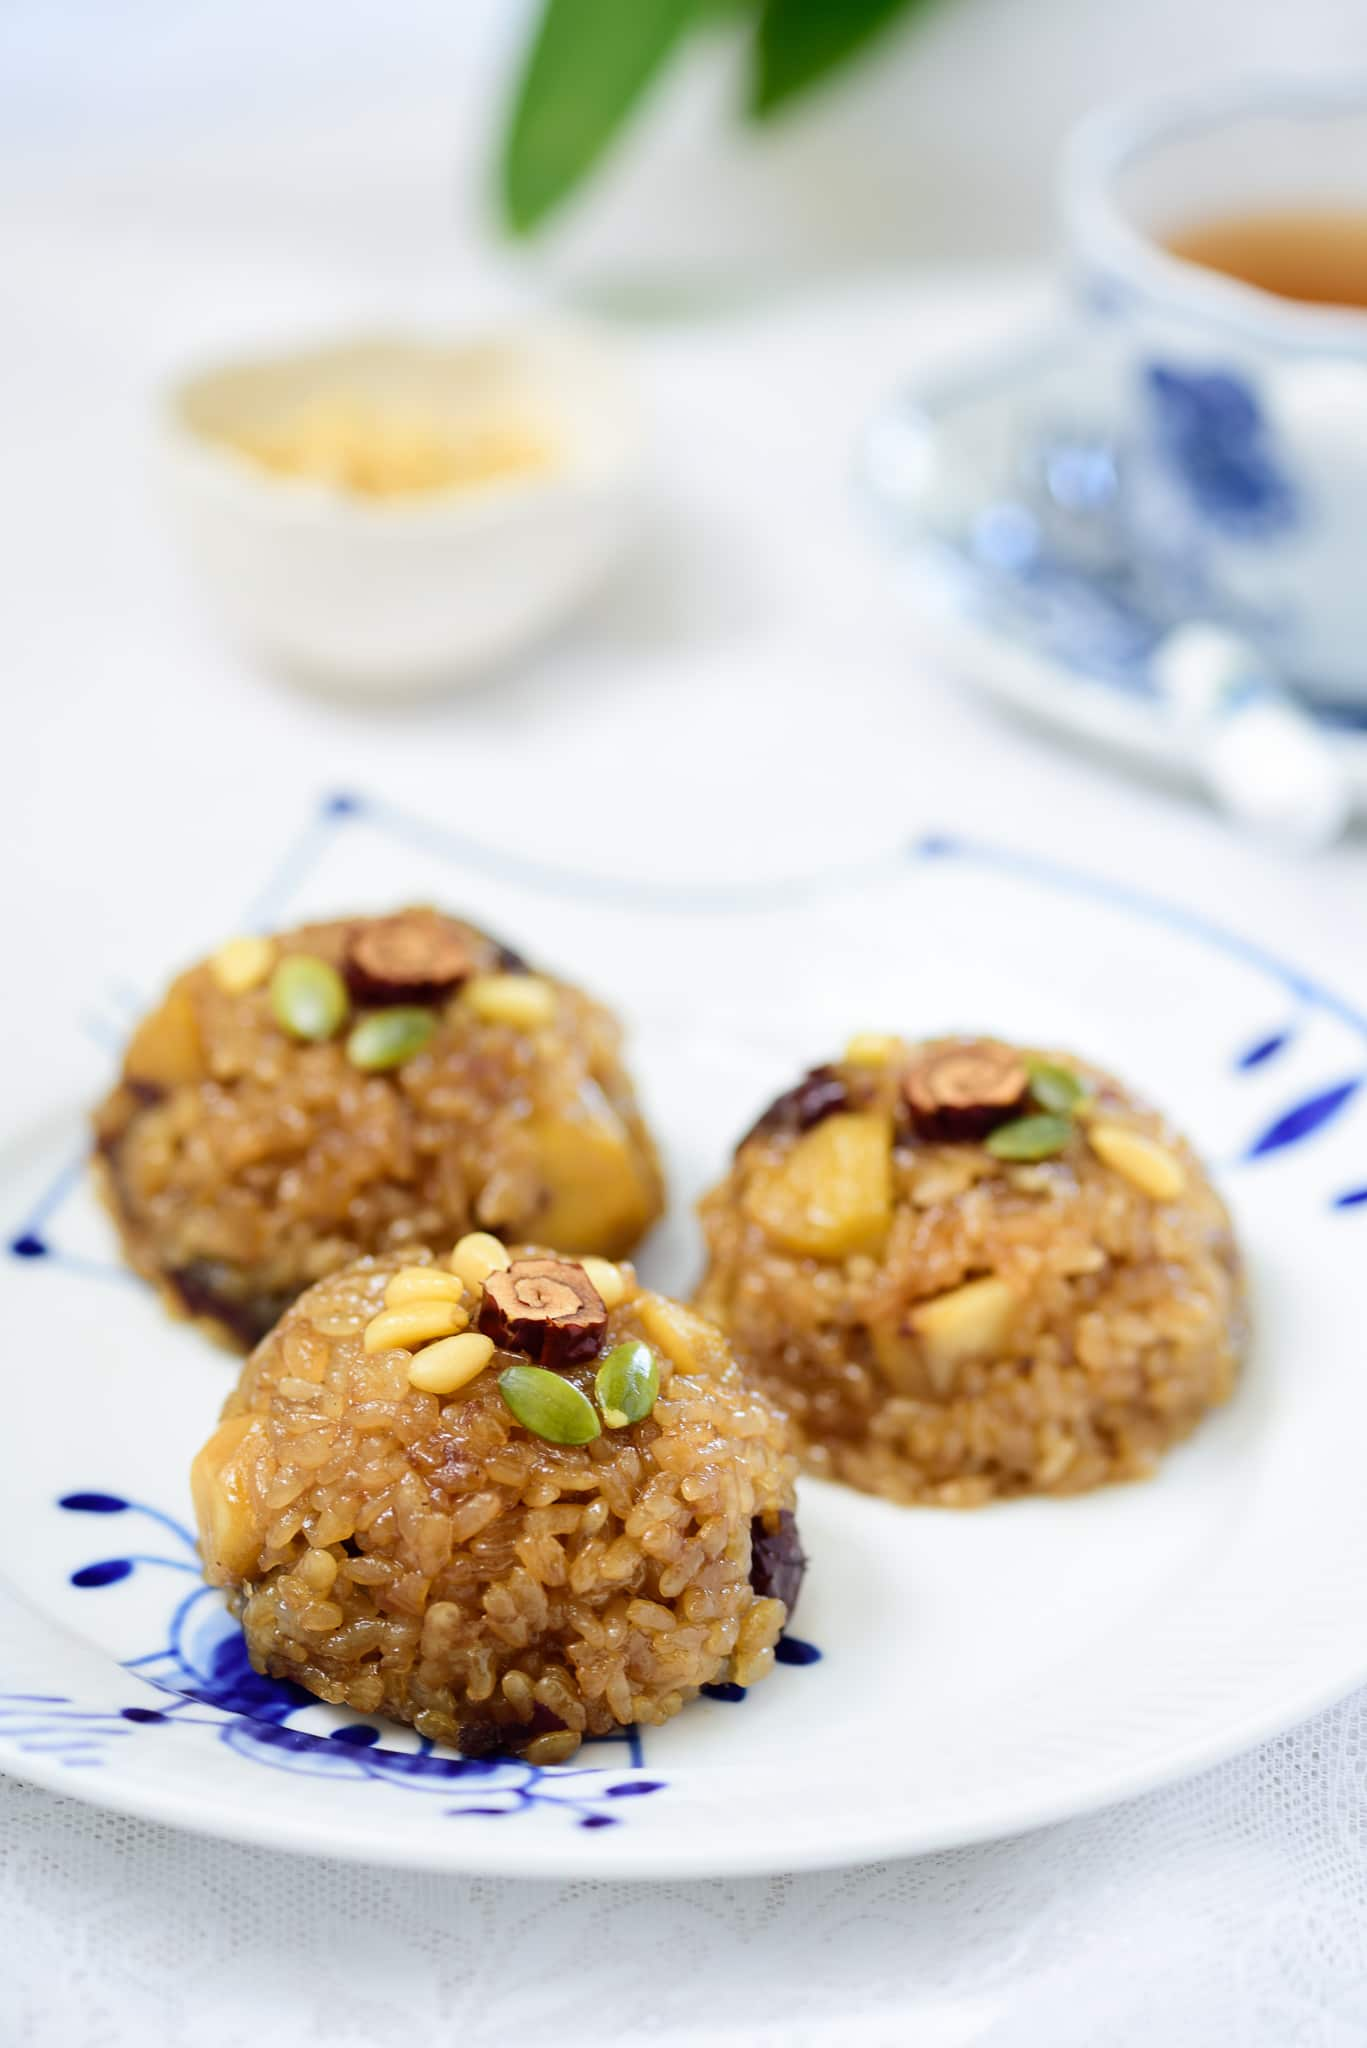 Korean sweet rice deThree round shaped Korean sweet rice dessert in a plate